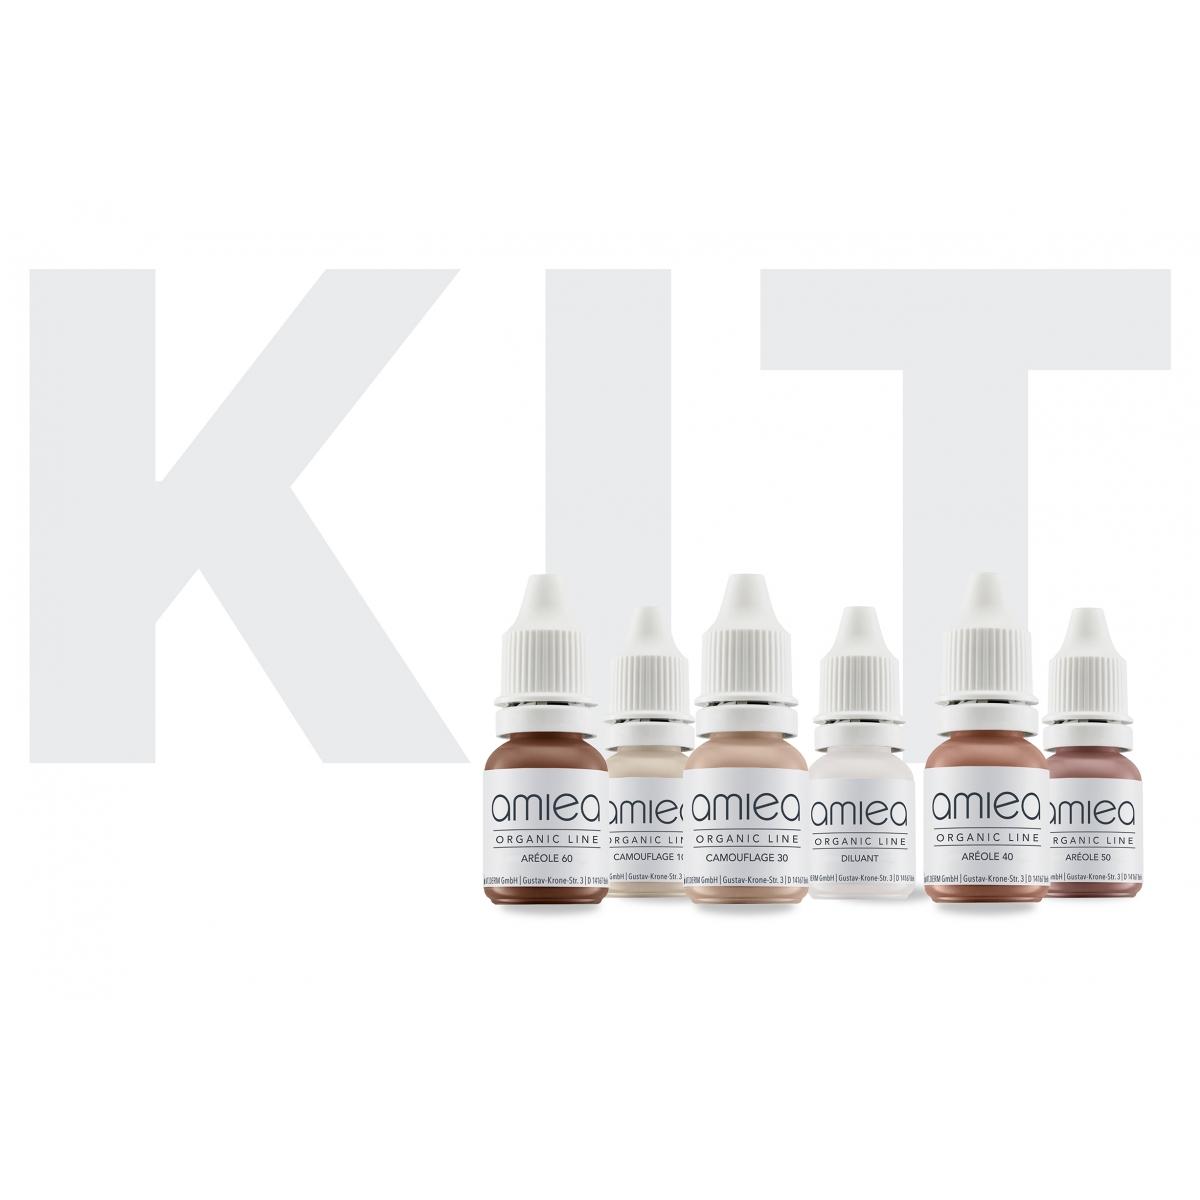 KITS COMPLETS - KIT AMIEA ESSENTIELS MIXTE - LIFE REPAIR (5 ml)